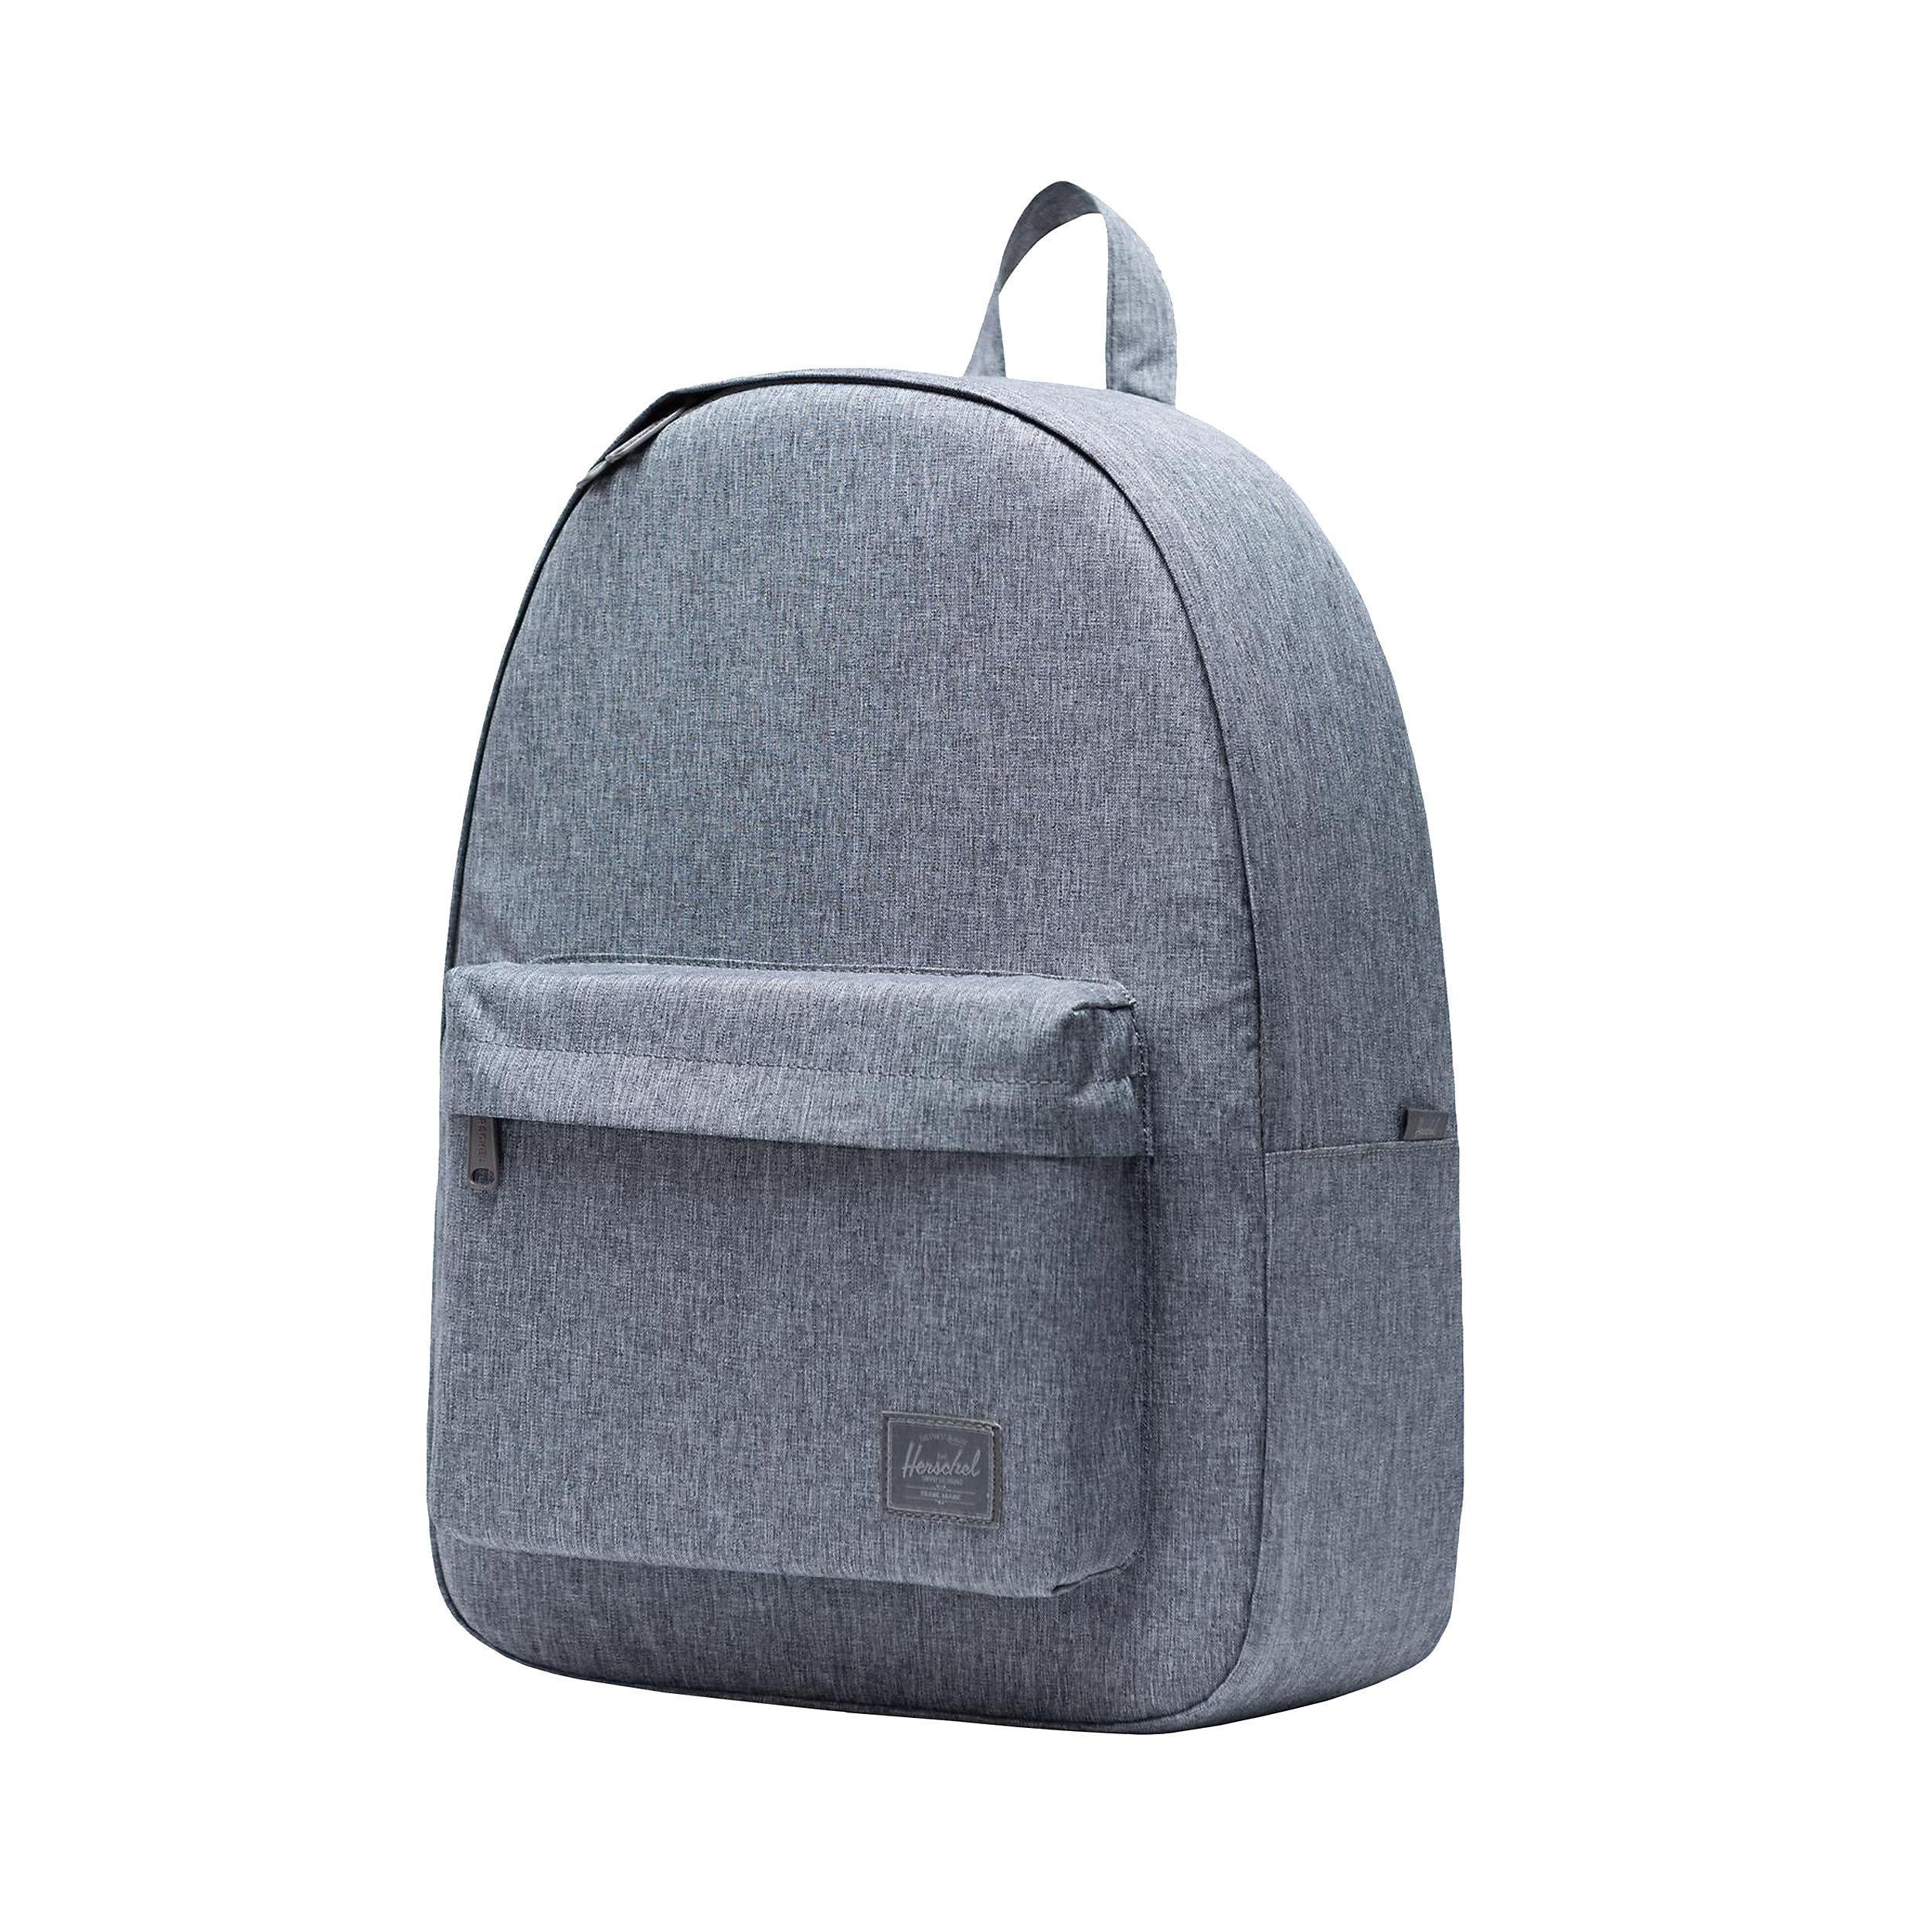 Backpack Classic Light Classic Light 24 Liter